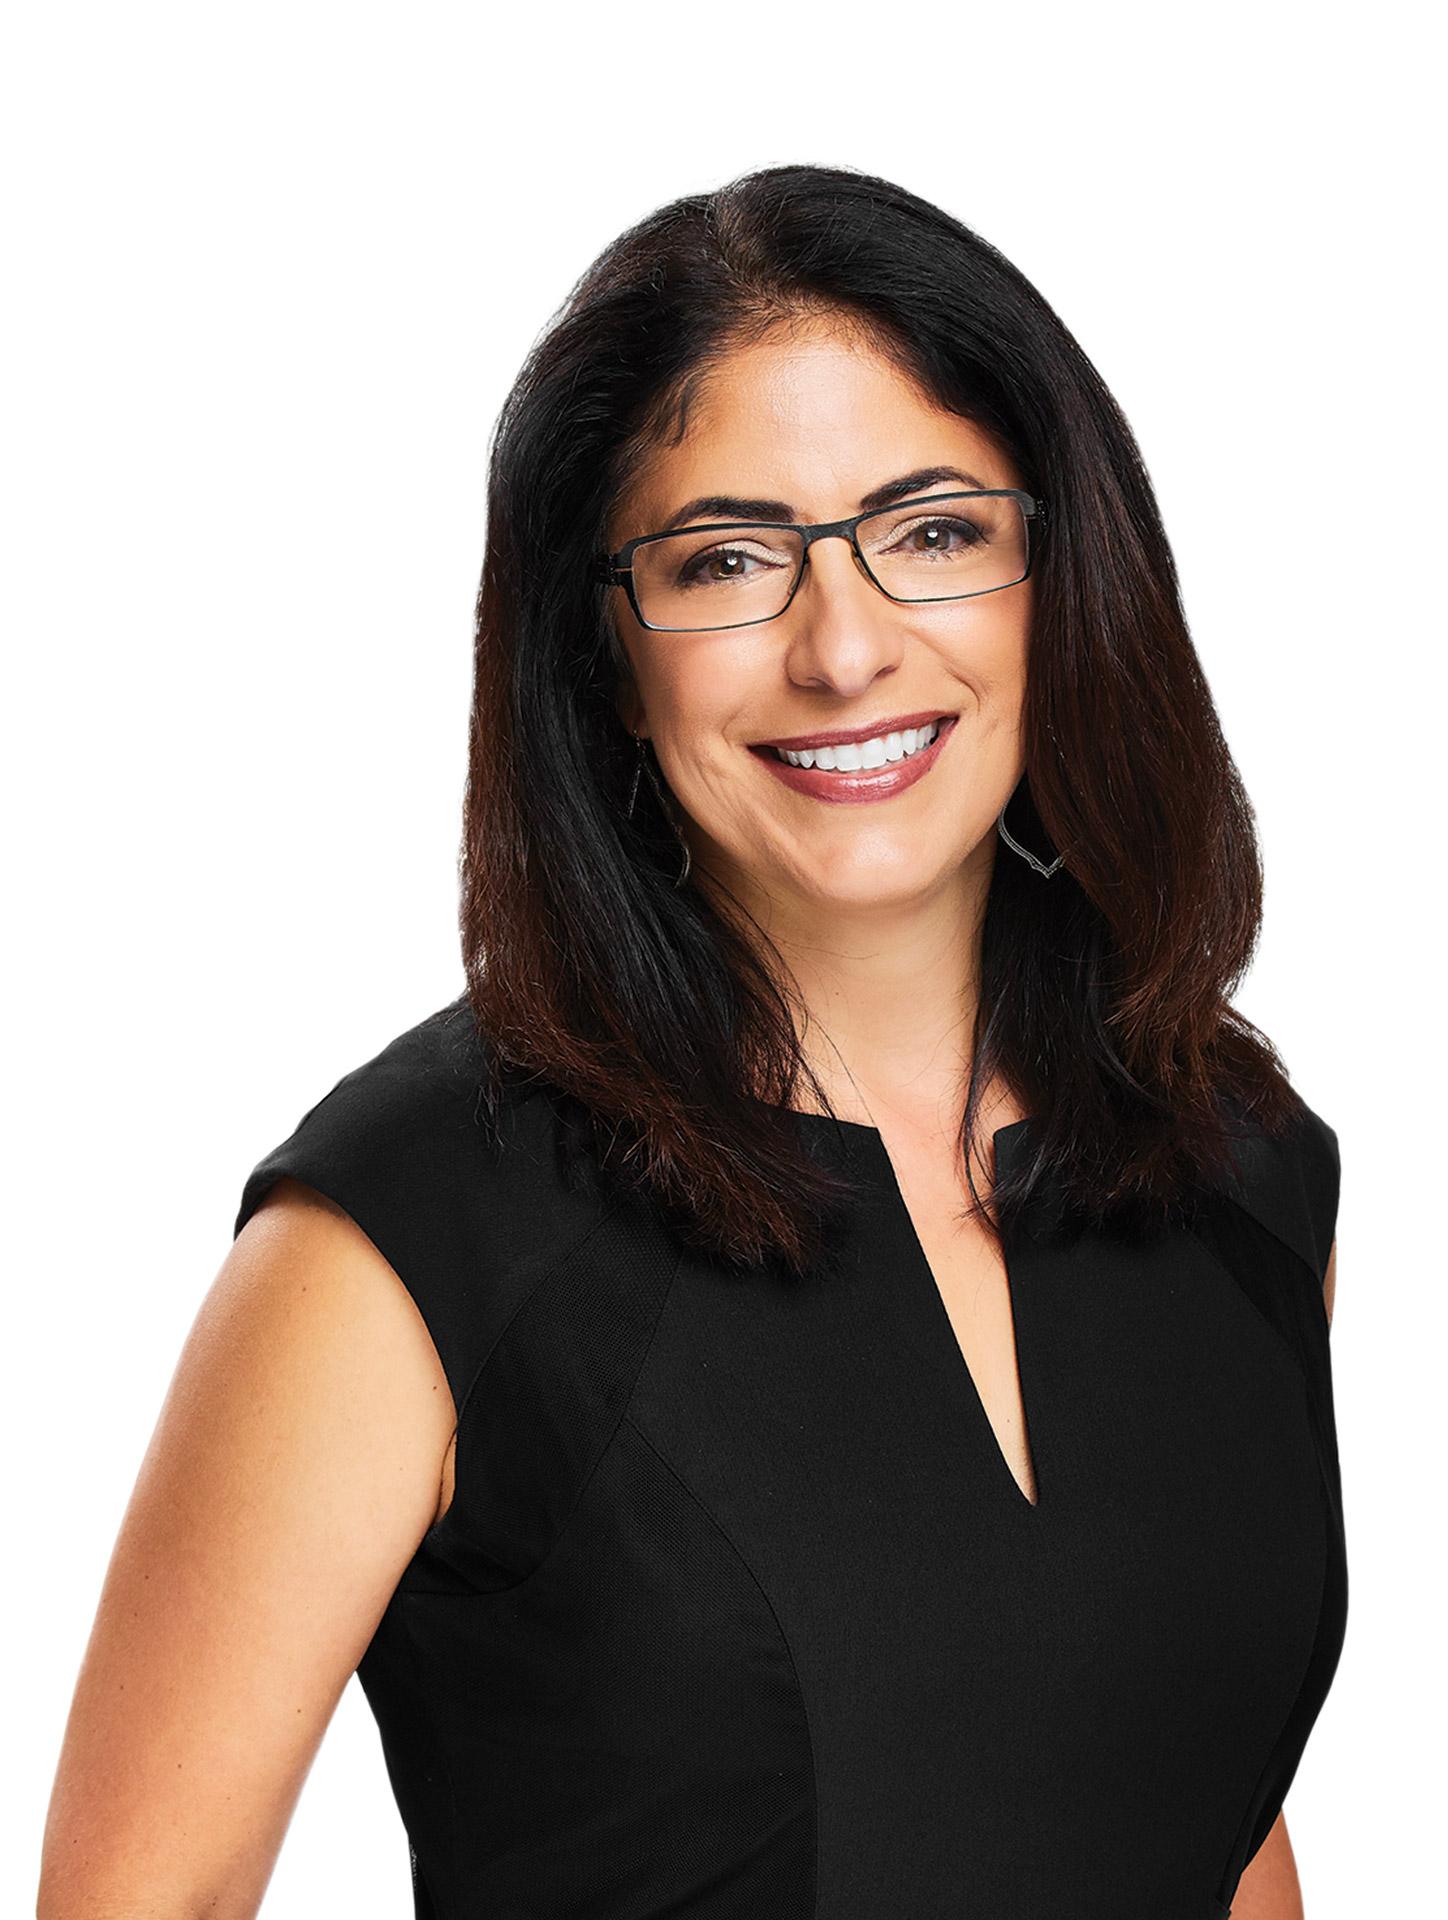 Cristina Valdes profile image